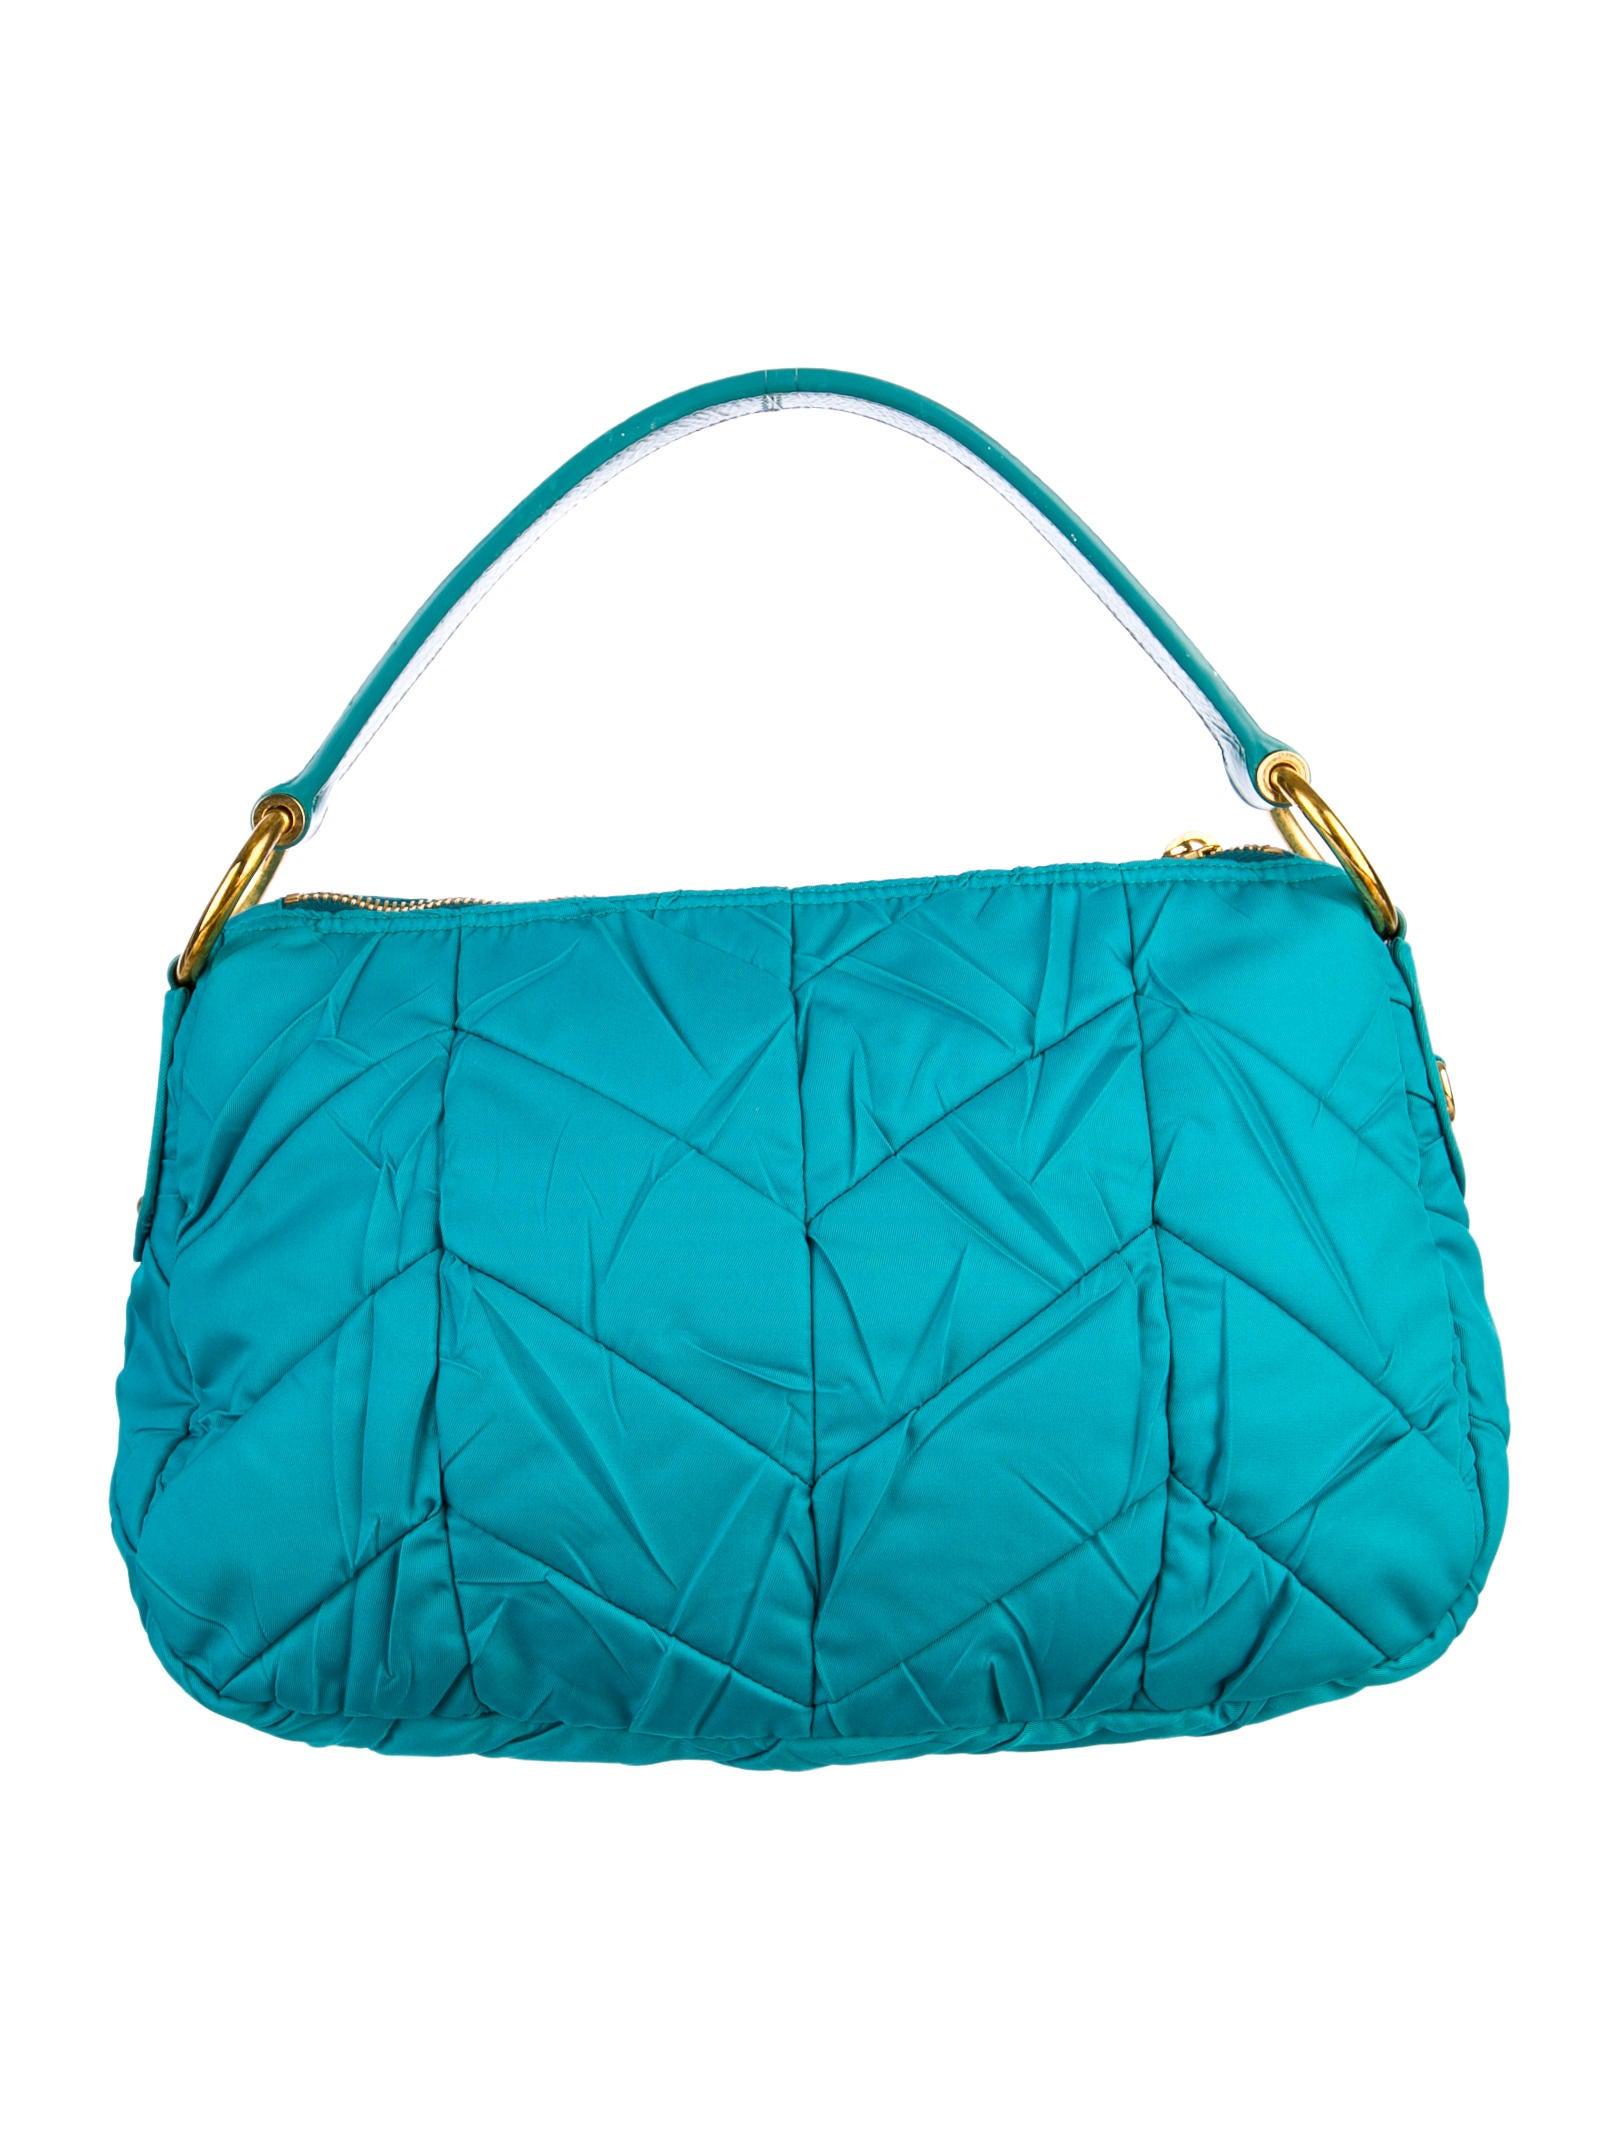 Prada Chevron Quilted Tessuto Bag - Handbags - PRA39060 | The RealReal